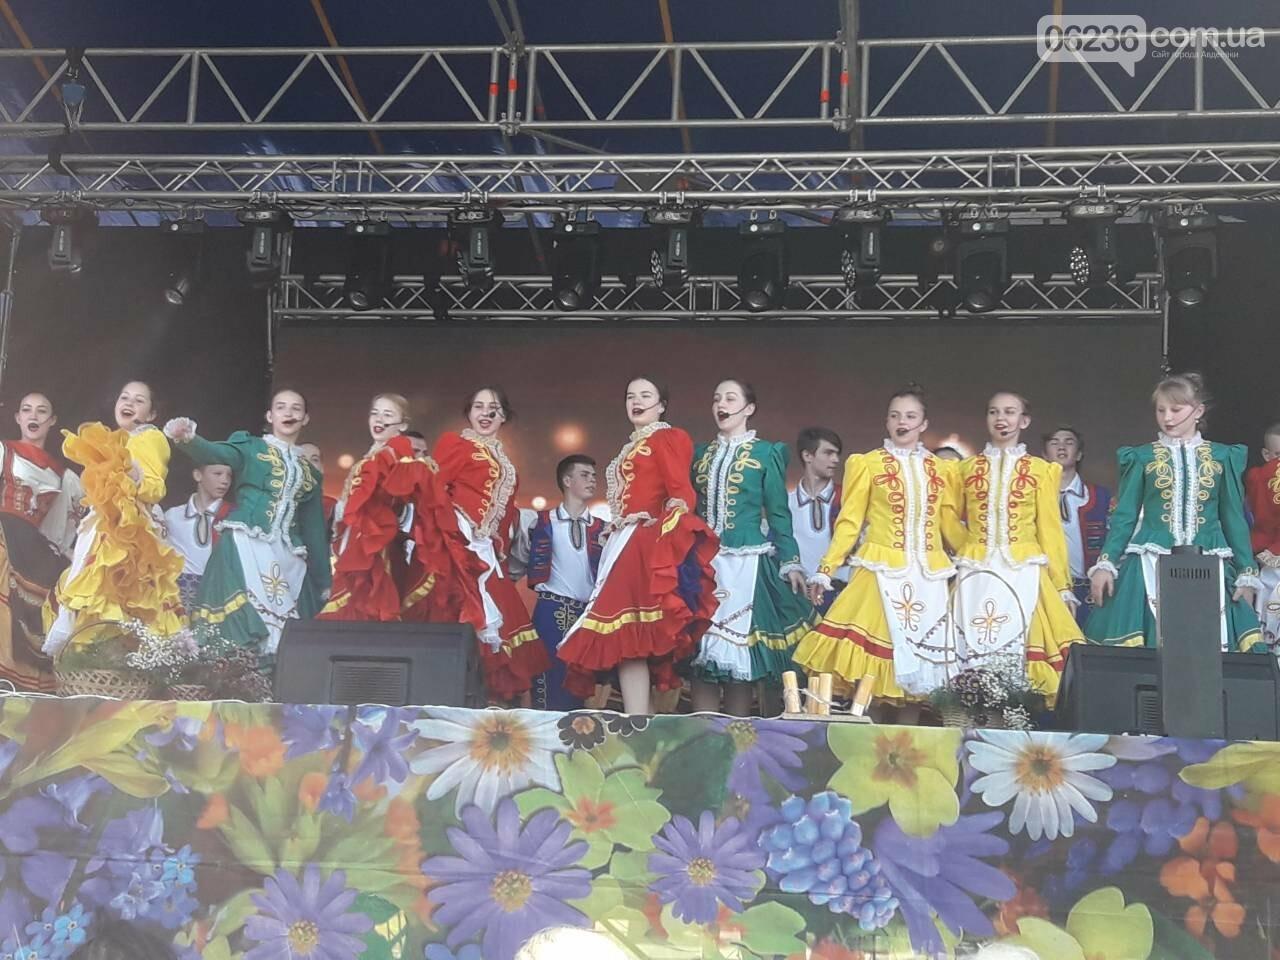 Авдеевка блистала на фестивале ко Дню Европы в Бахмуте (ФОТО/ВИДЕО)   , фото-2